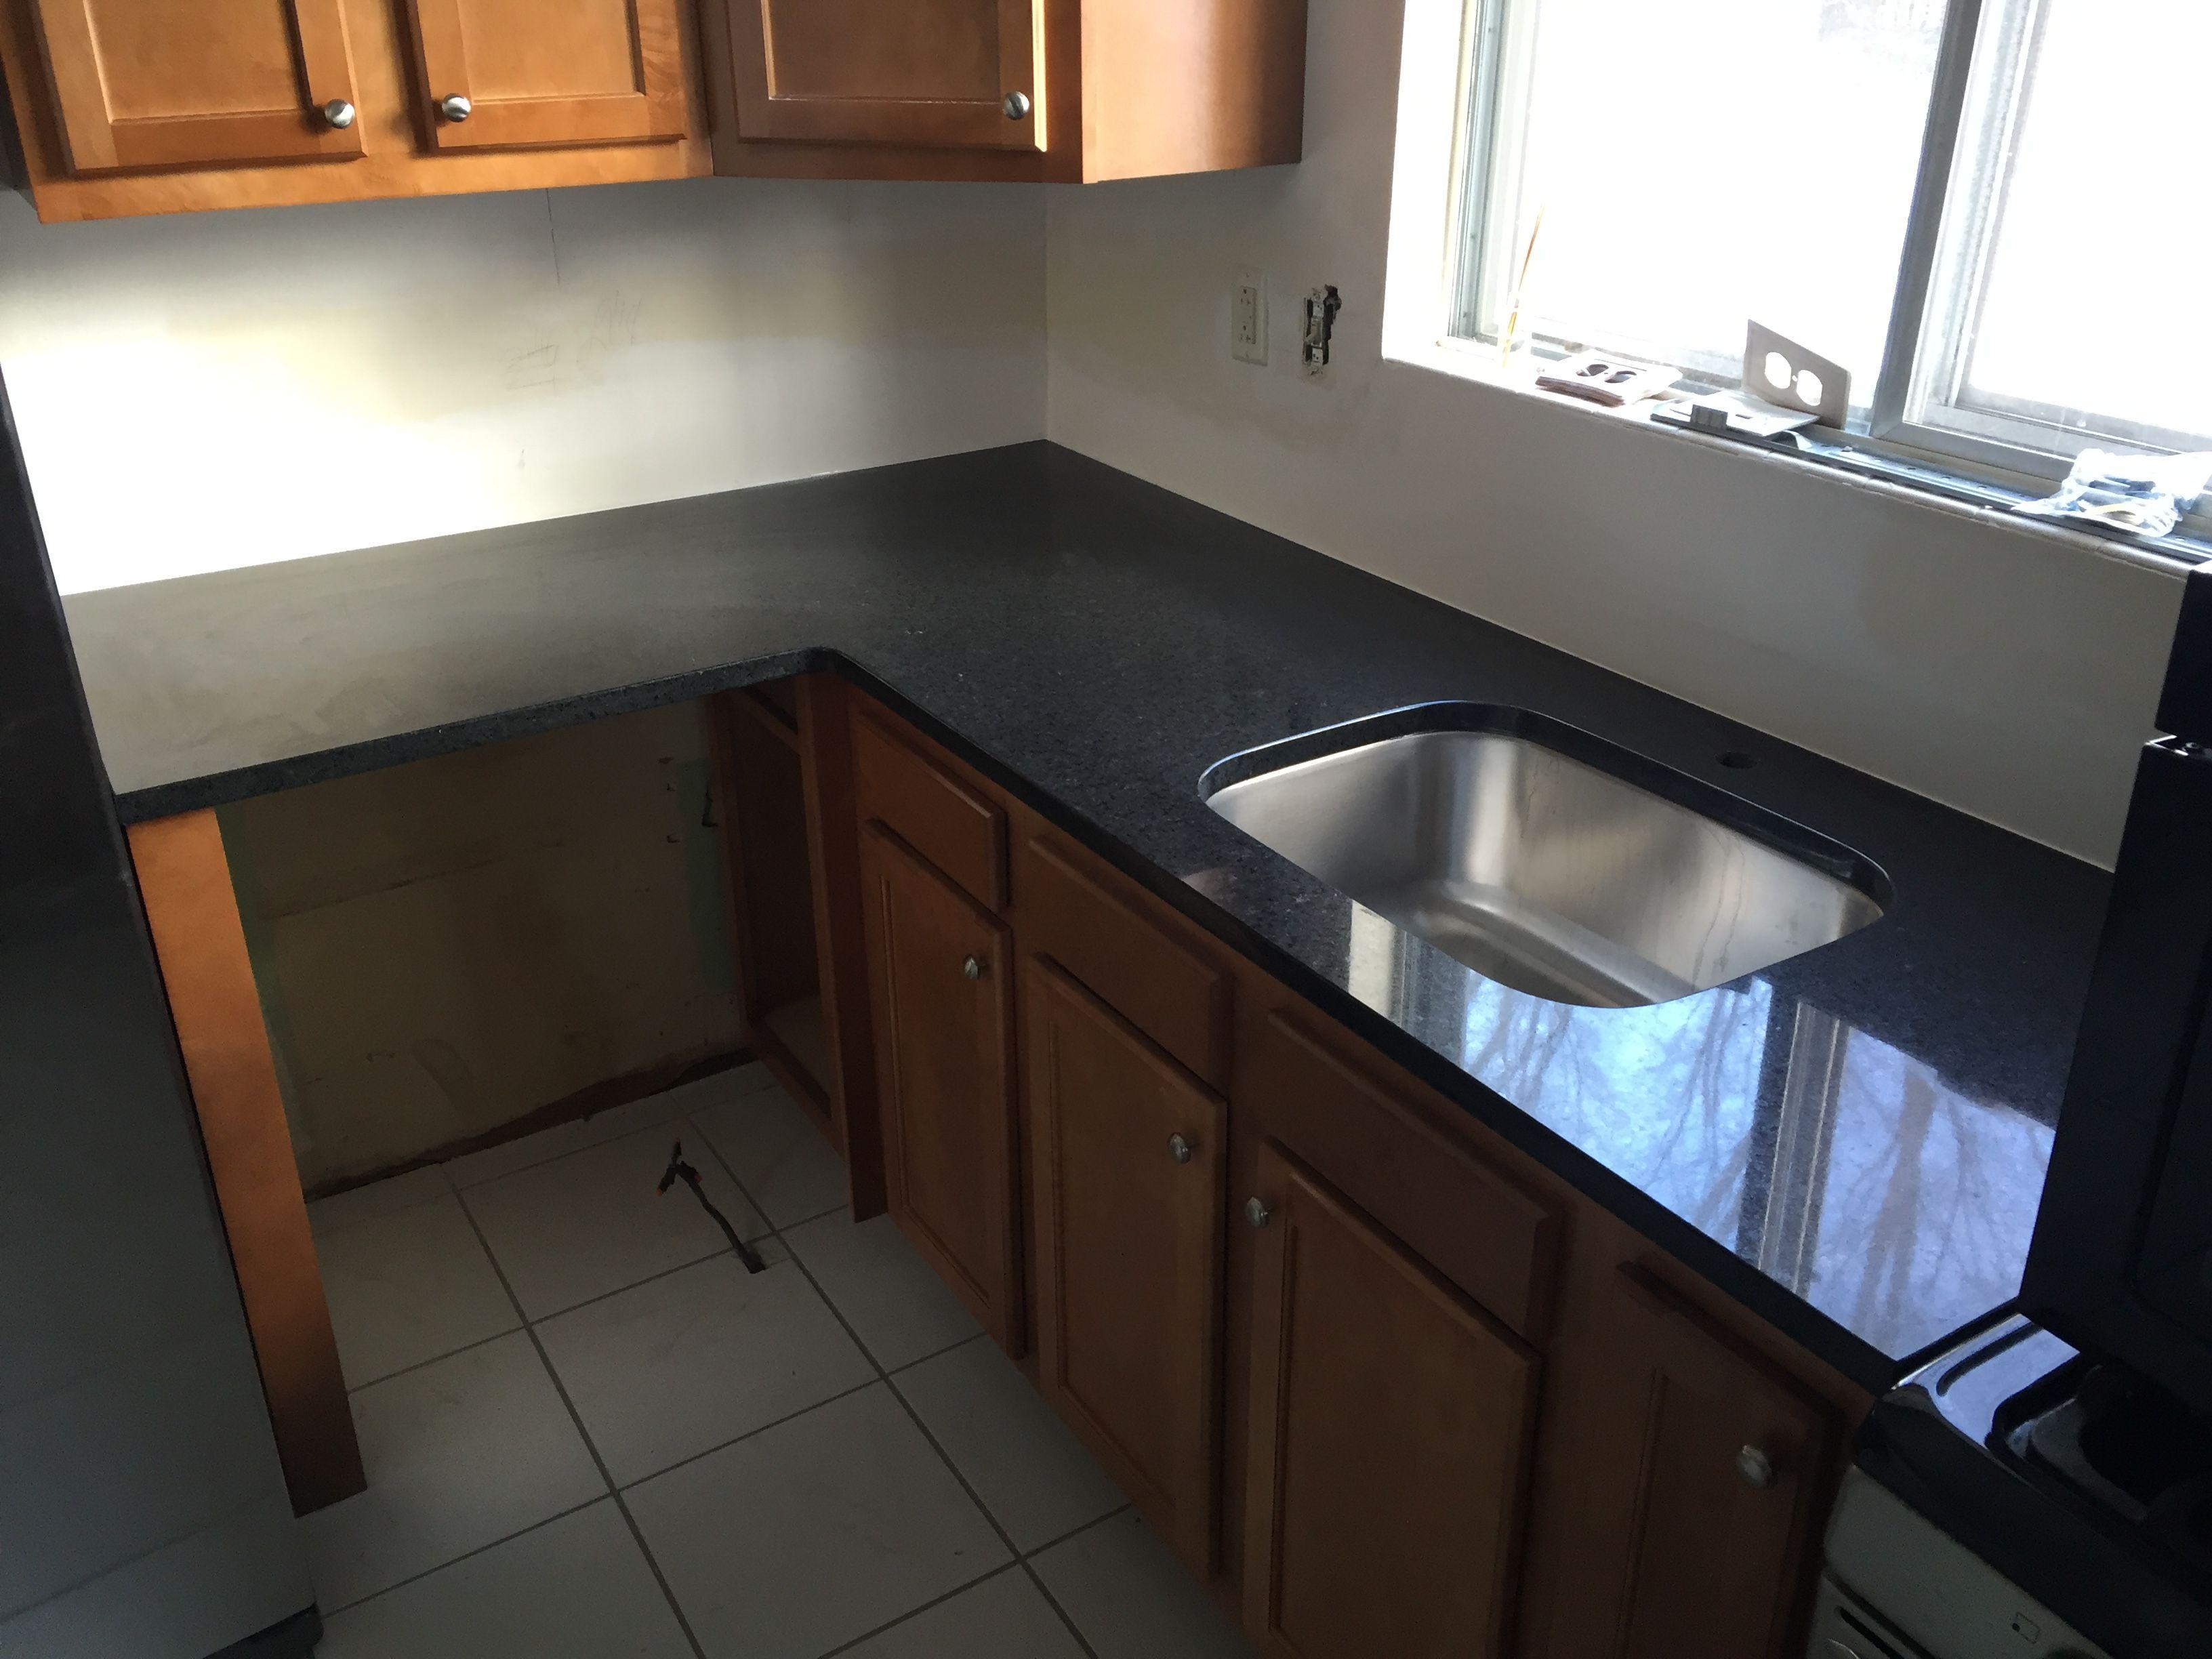 Countertop Material Granite Color Black San Marcos Location Newark De Www Elegantlysetinstone Com Kitchen Cabinets Kitchen Home Decor